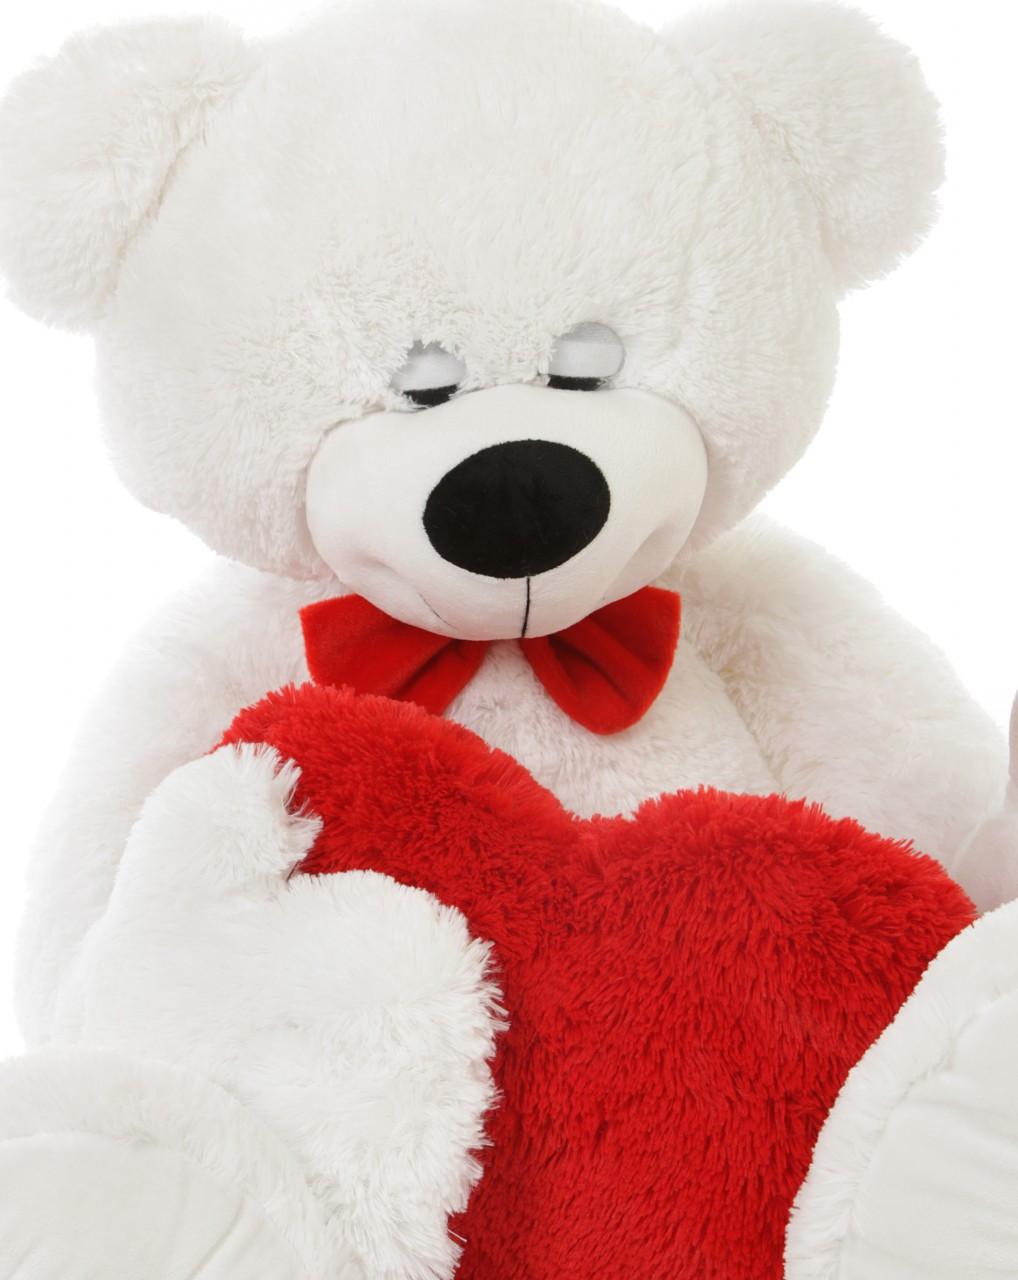 White Cute Sleepy Teddy Bear with Fluffy Red Heart